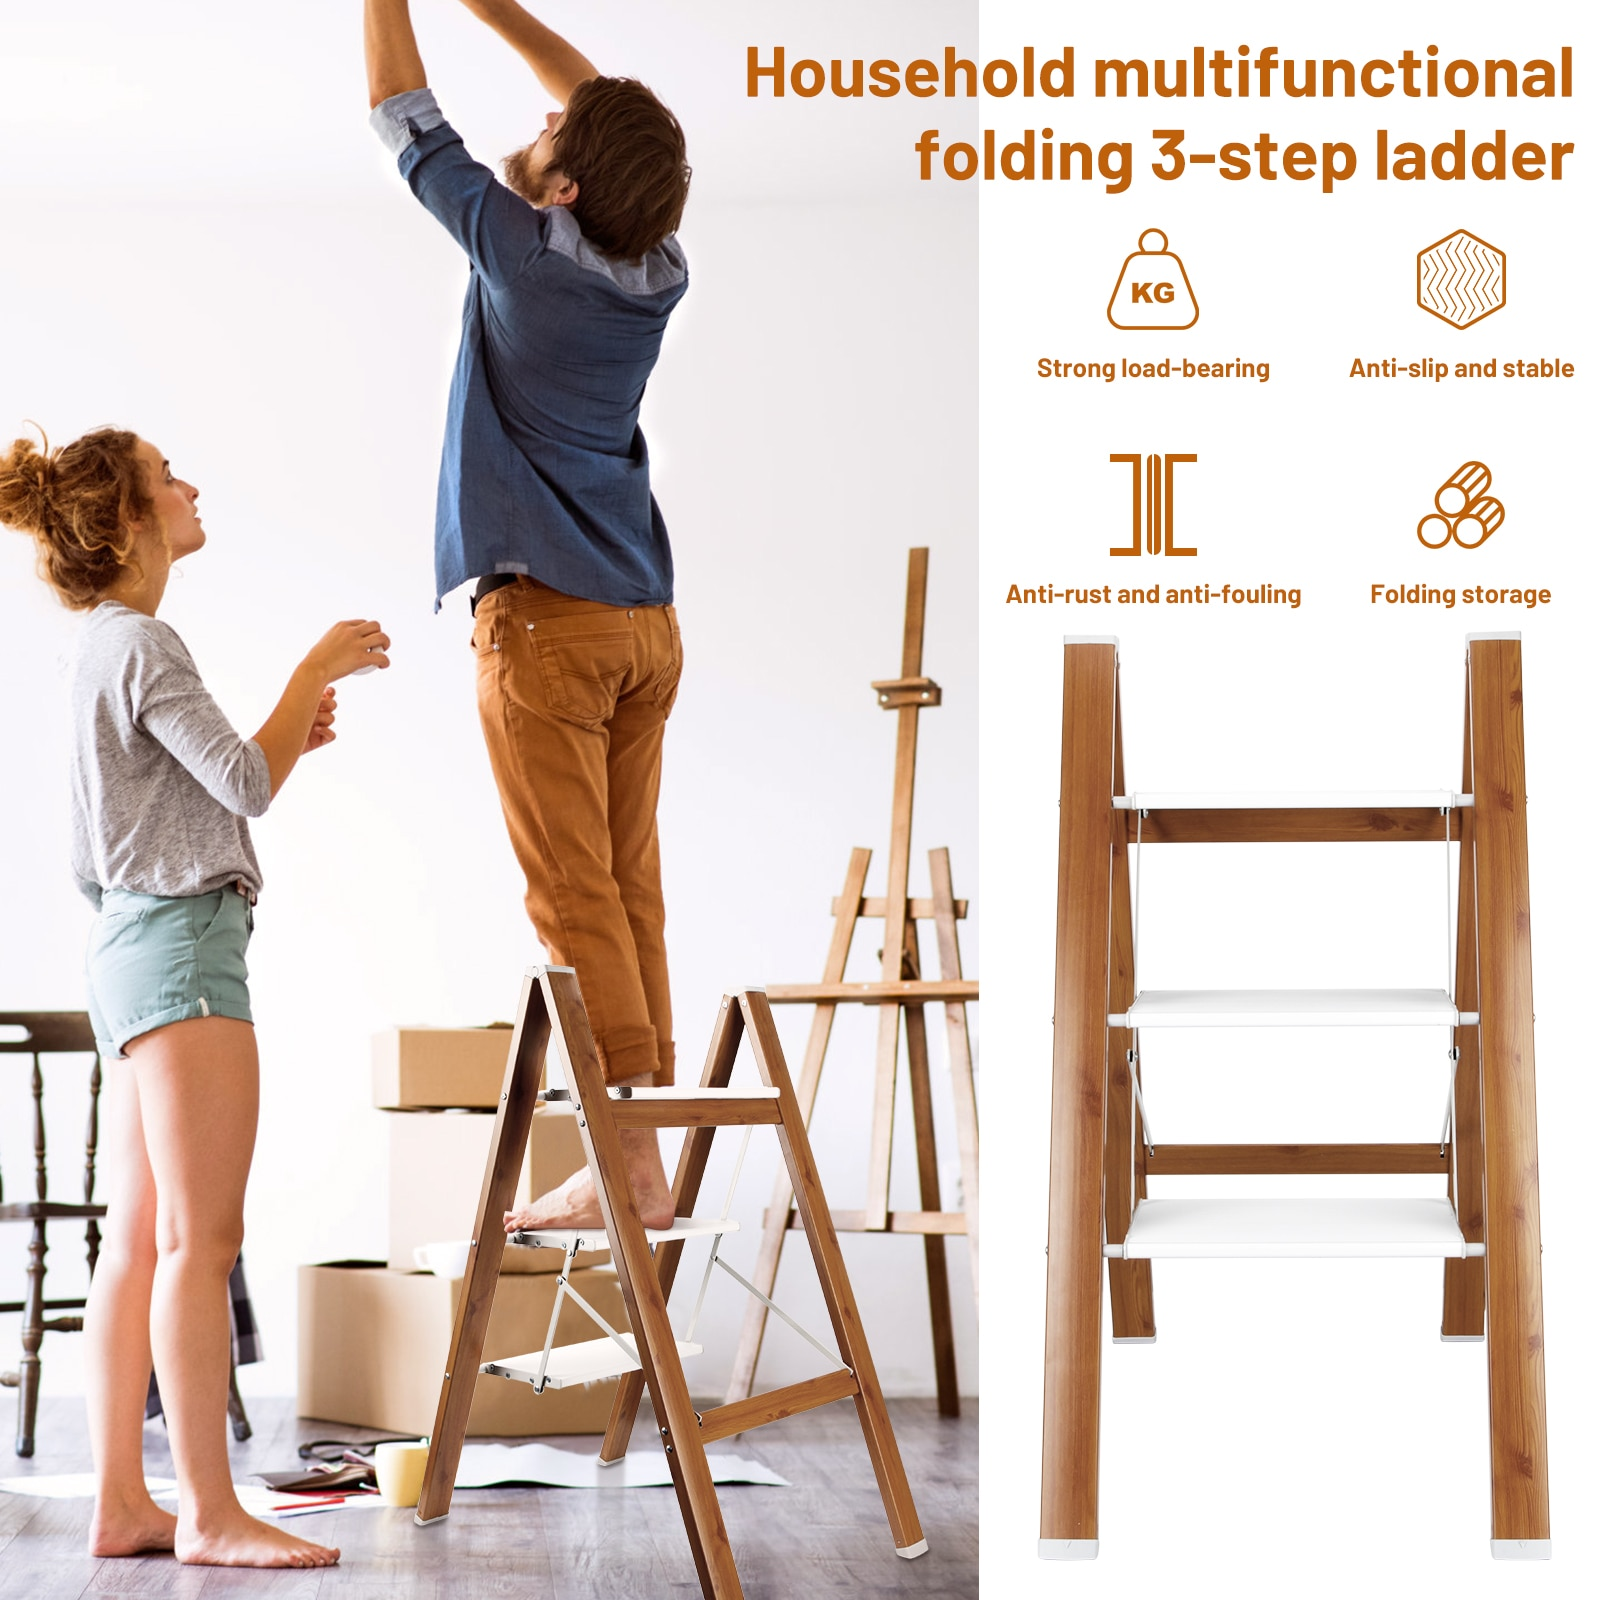 Household Multifunctional Folding Ladder Thickened Aluminum Alloy Herringbone Ladder Three Step Stairs Portable Small Bench Kitc